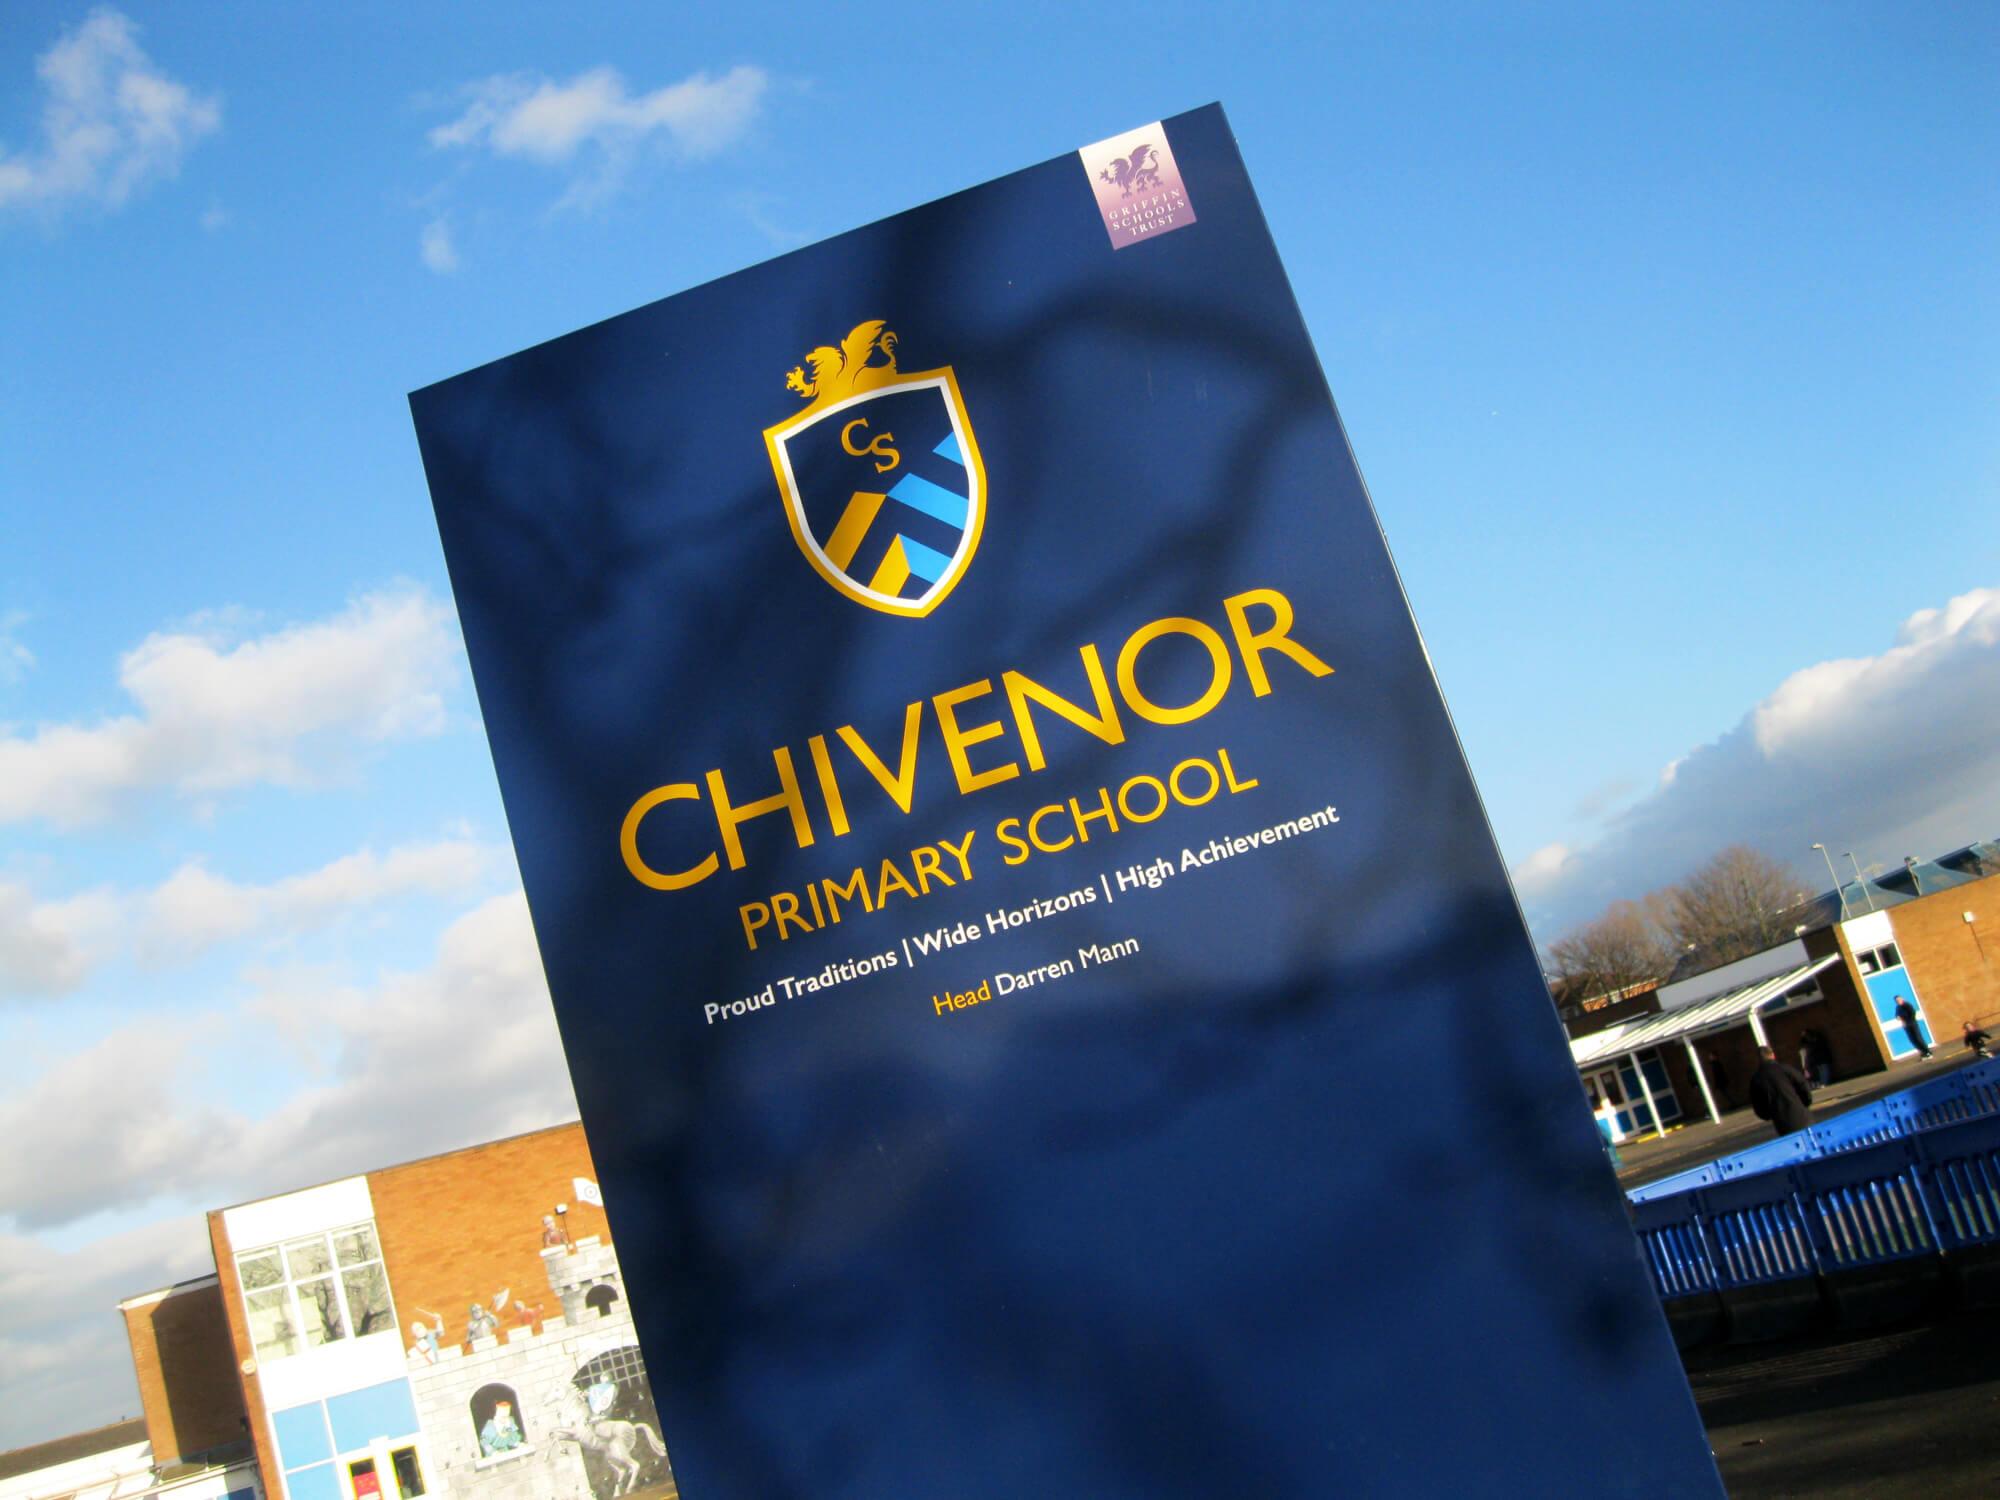 chivenor_primary_school_tetem_01.jpg